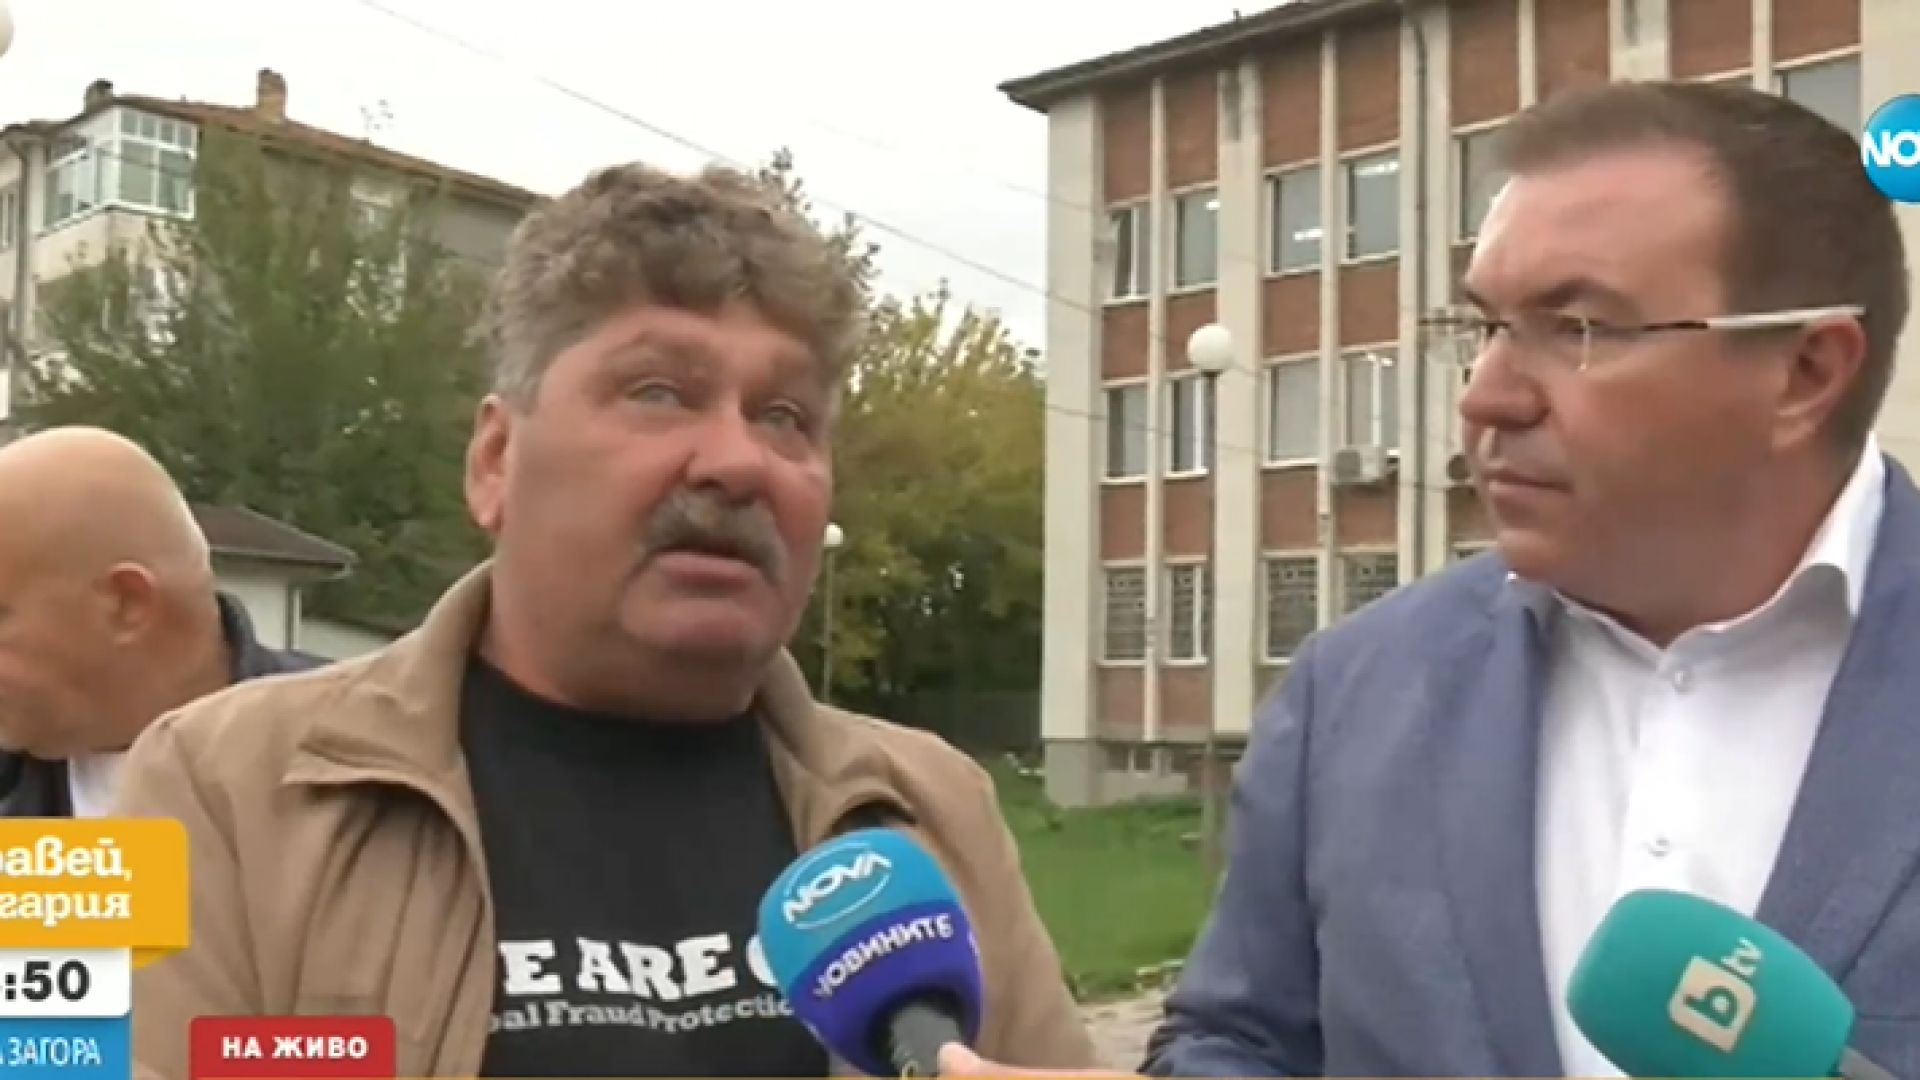 Полицейски призовки преди вота в Стражица, Костадин Ангелов обвини властта в милиционерщина